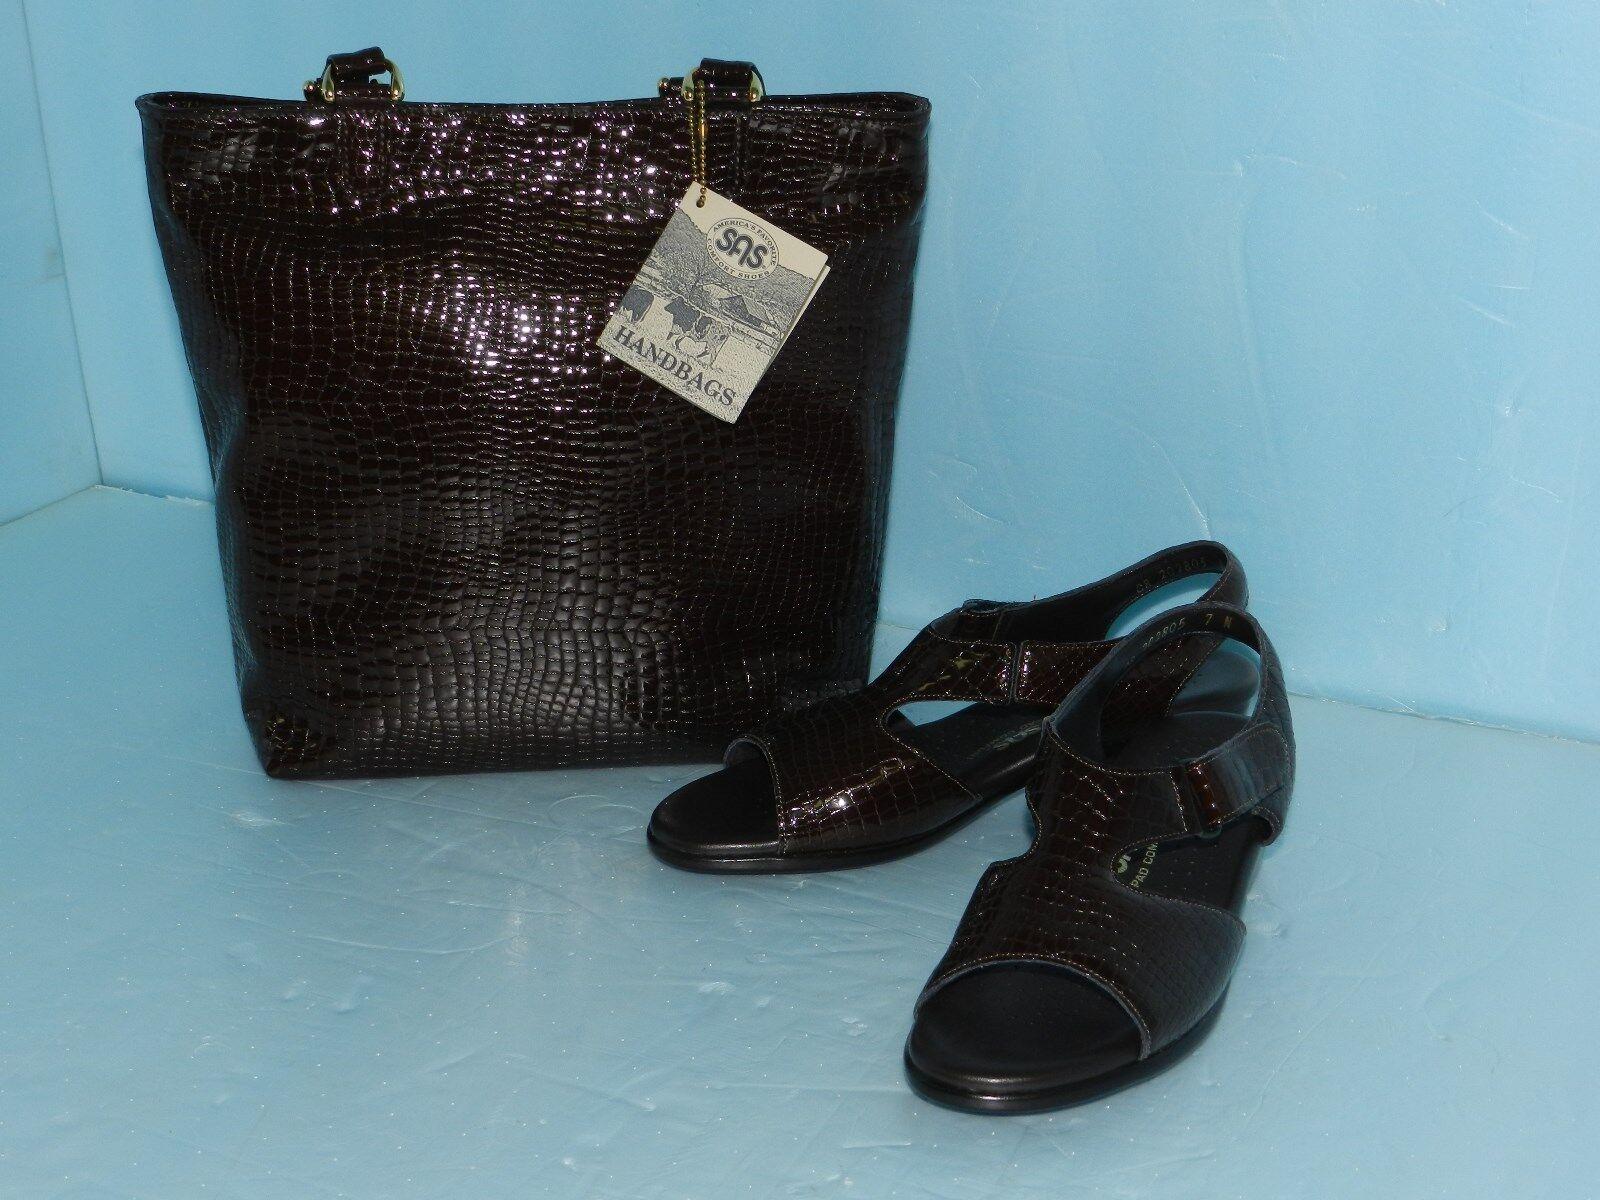 SAS~Gorgeous Tripad Embossed Leather Alligator Sandals & NOS Purse w/ Tags~ NOS & 1166de